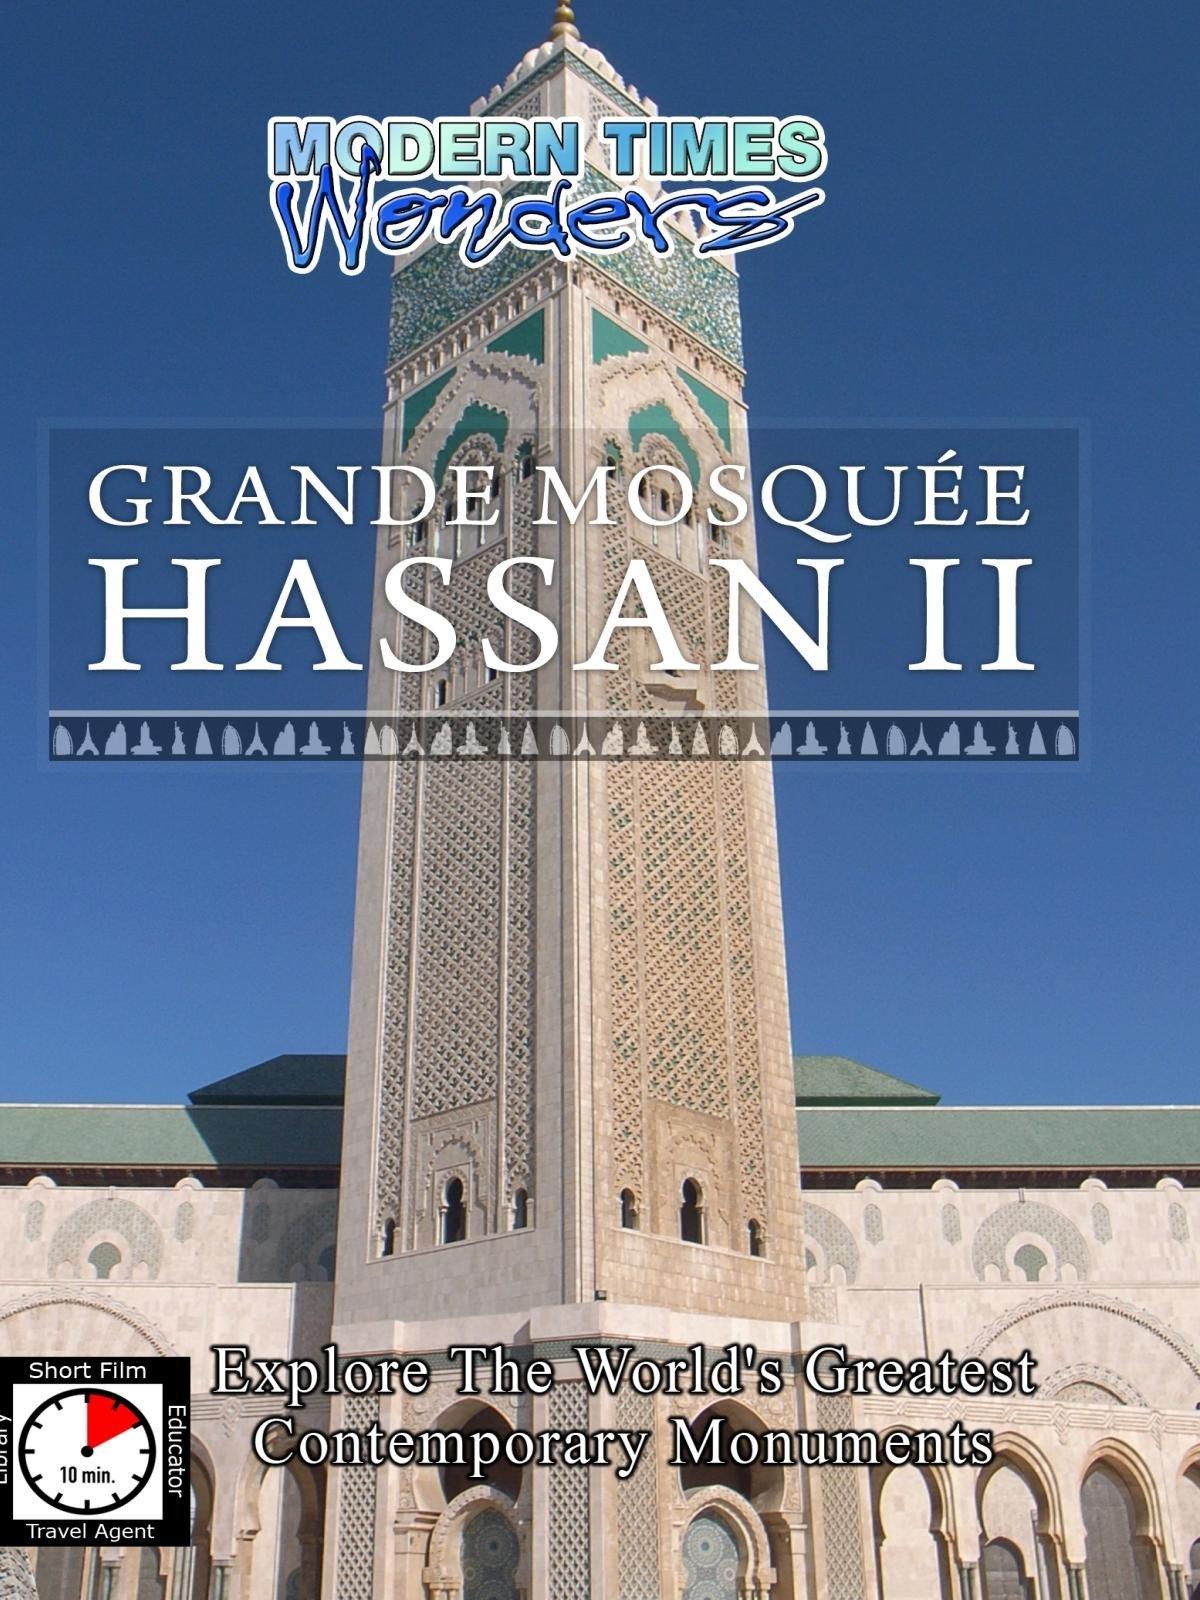 Modern Times Wonders - Grande Mosquee Hassan II, Casablanca, Morocco on Amazon Prime Video UK